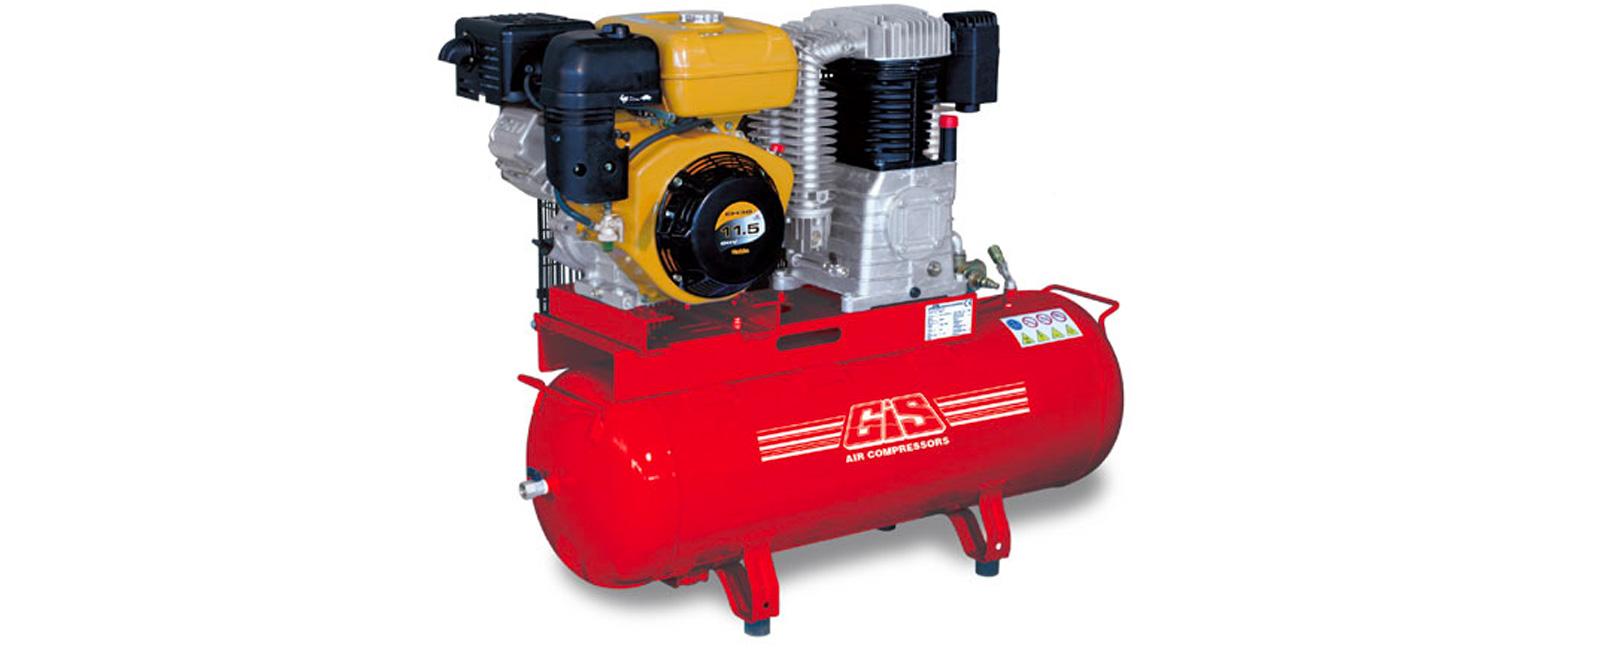 Motocompressori-industriali-su-misura